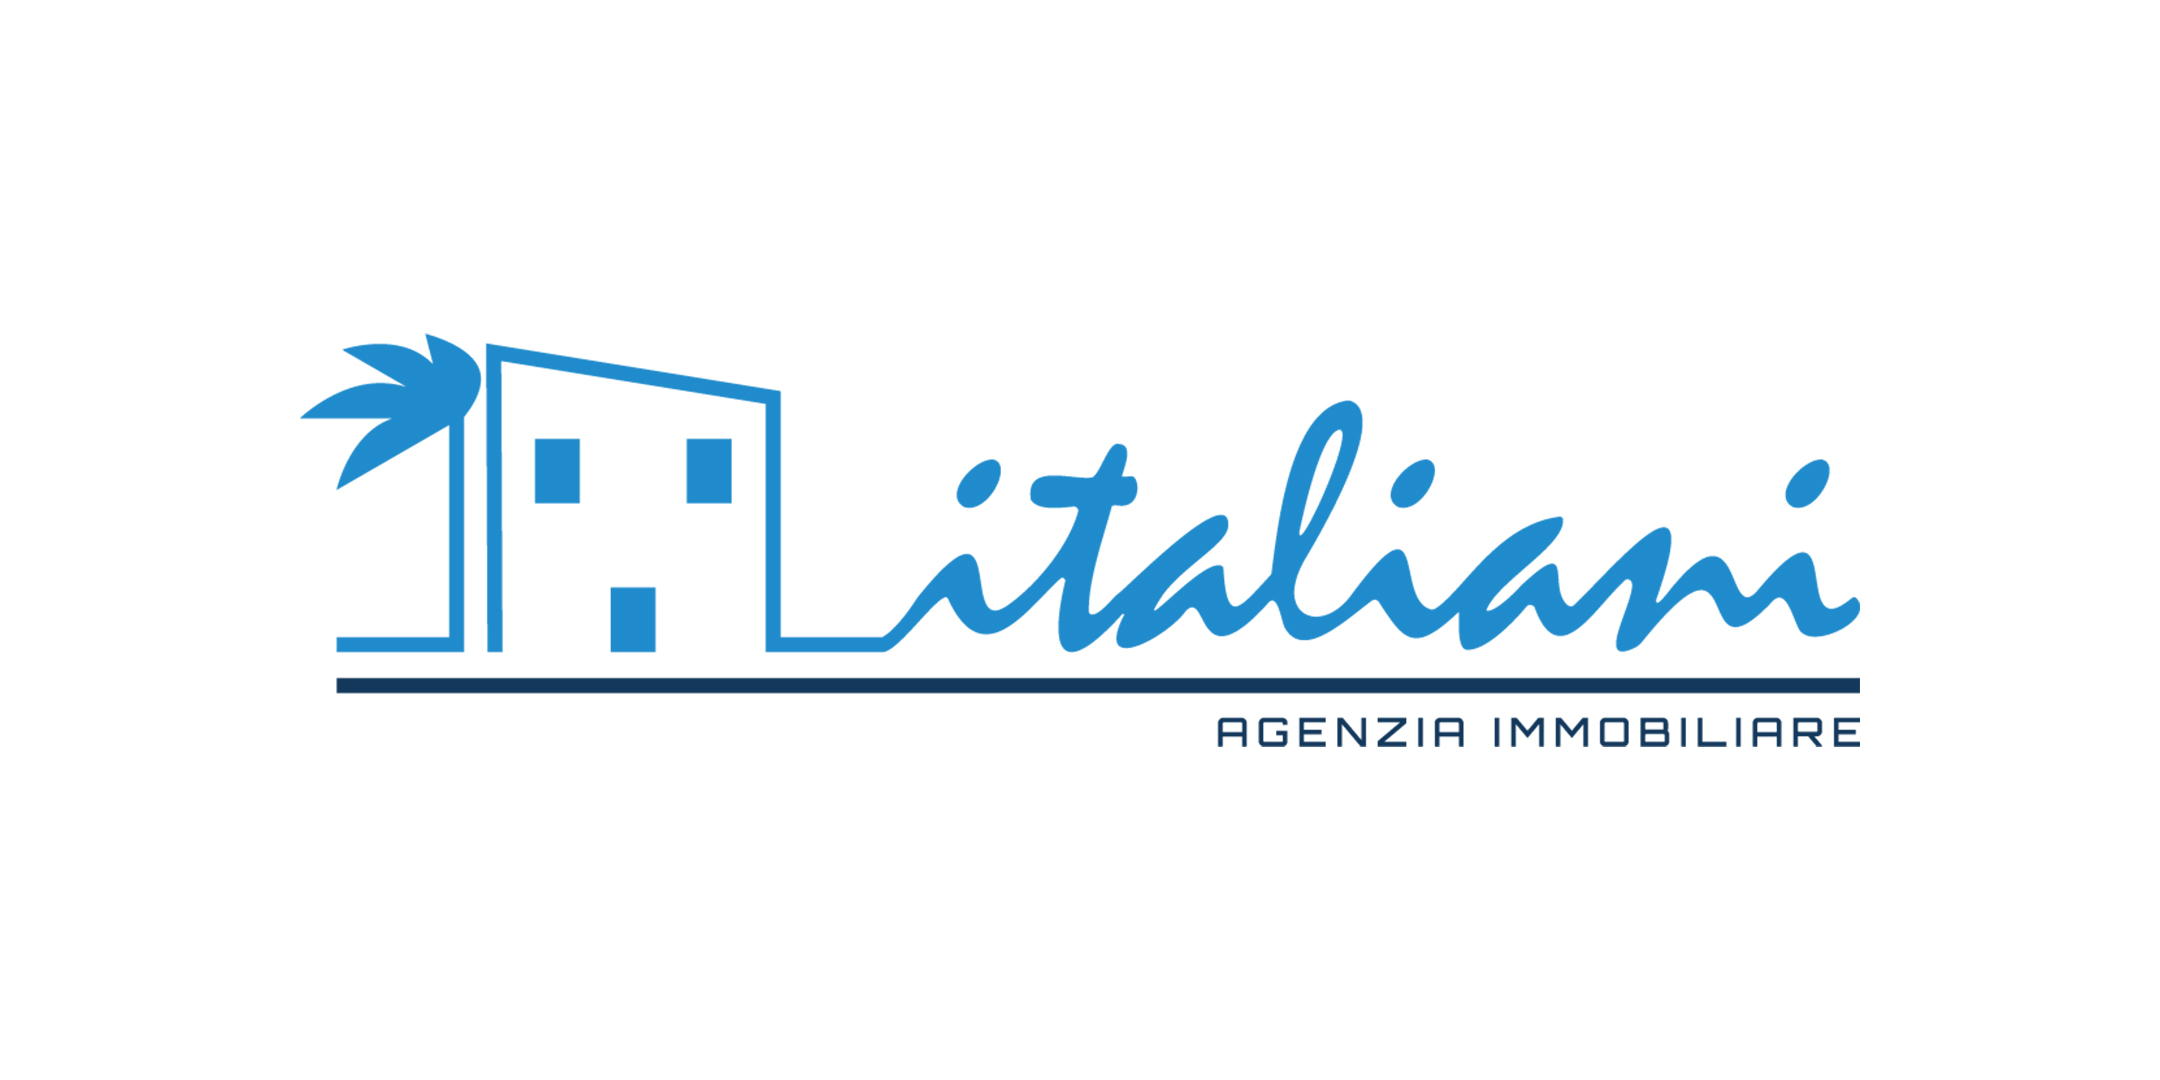 Agenzie Immobiliari Varazze agenzia immobiliare italiani - agenzia immobiliare varazze